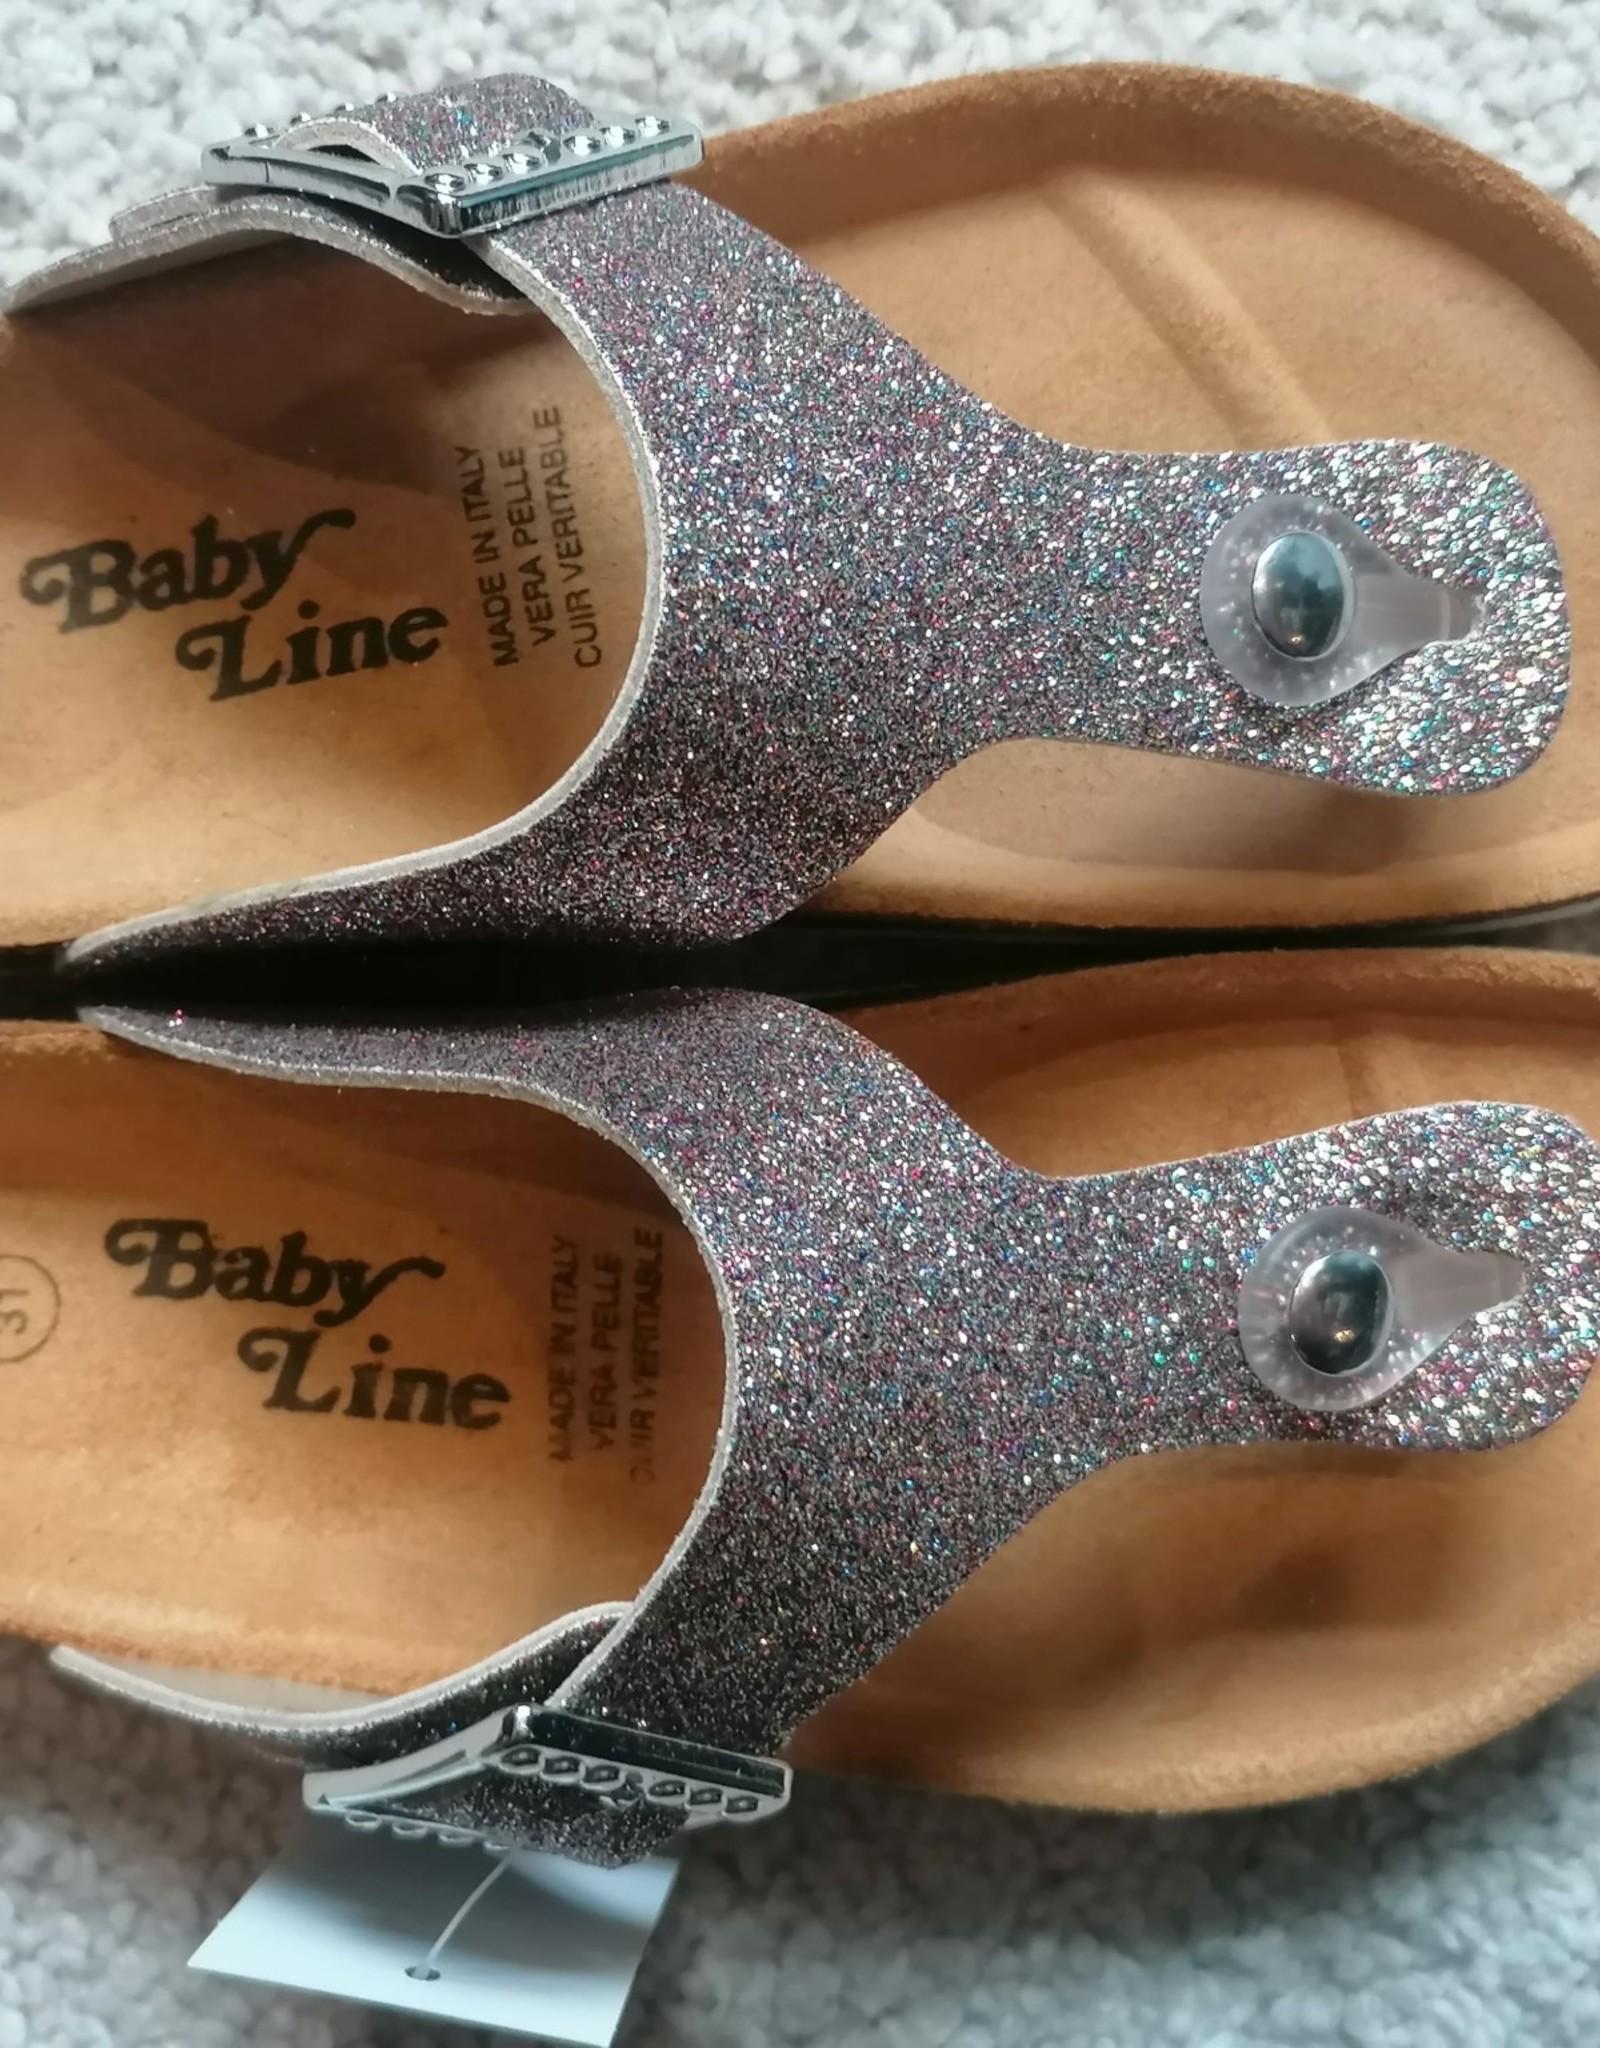 Babyline Babyline multi glitters